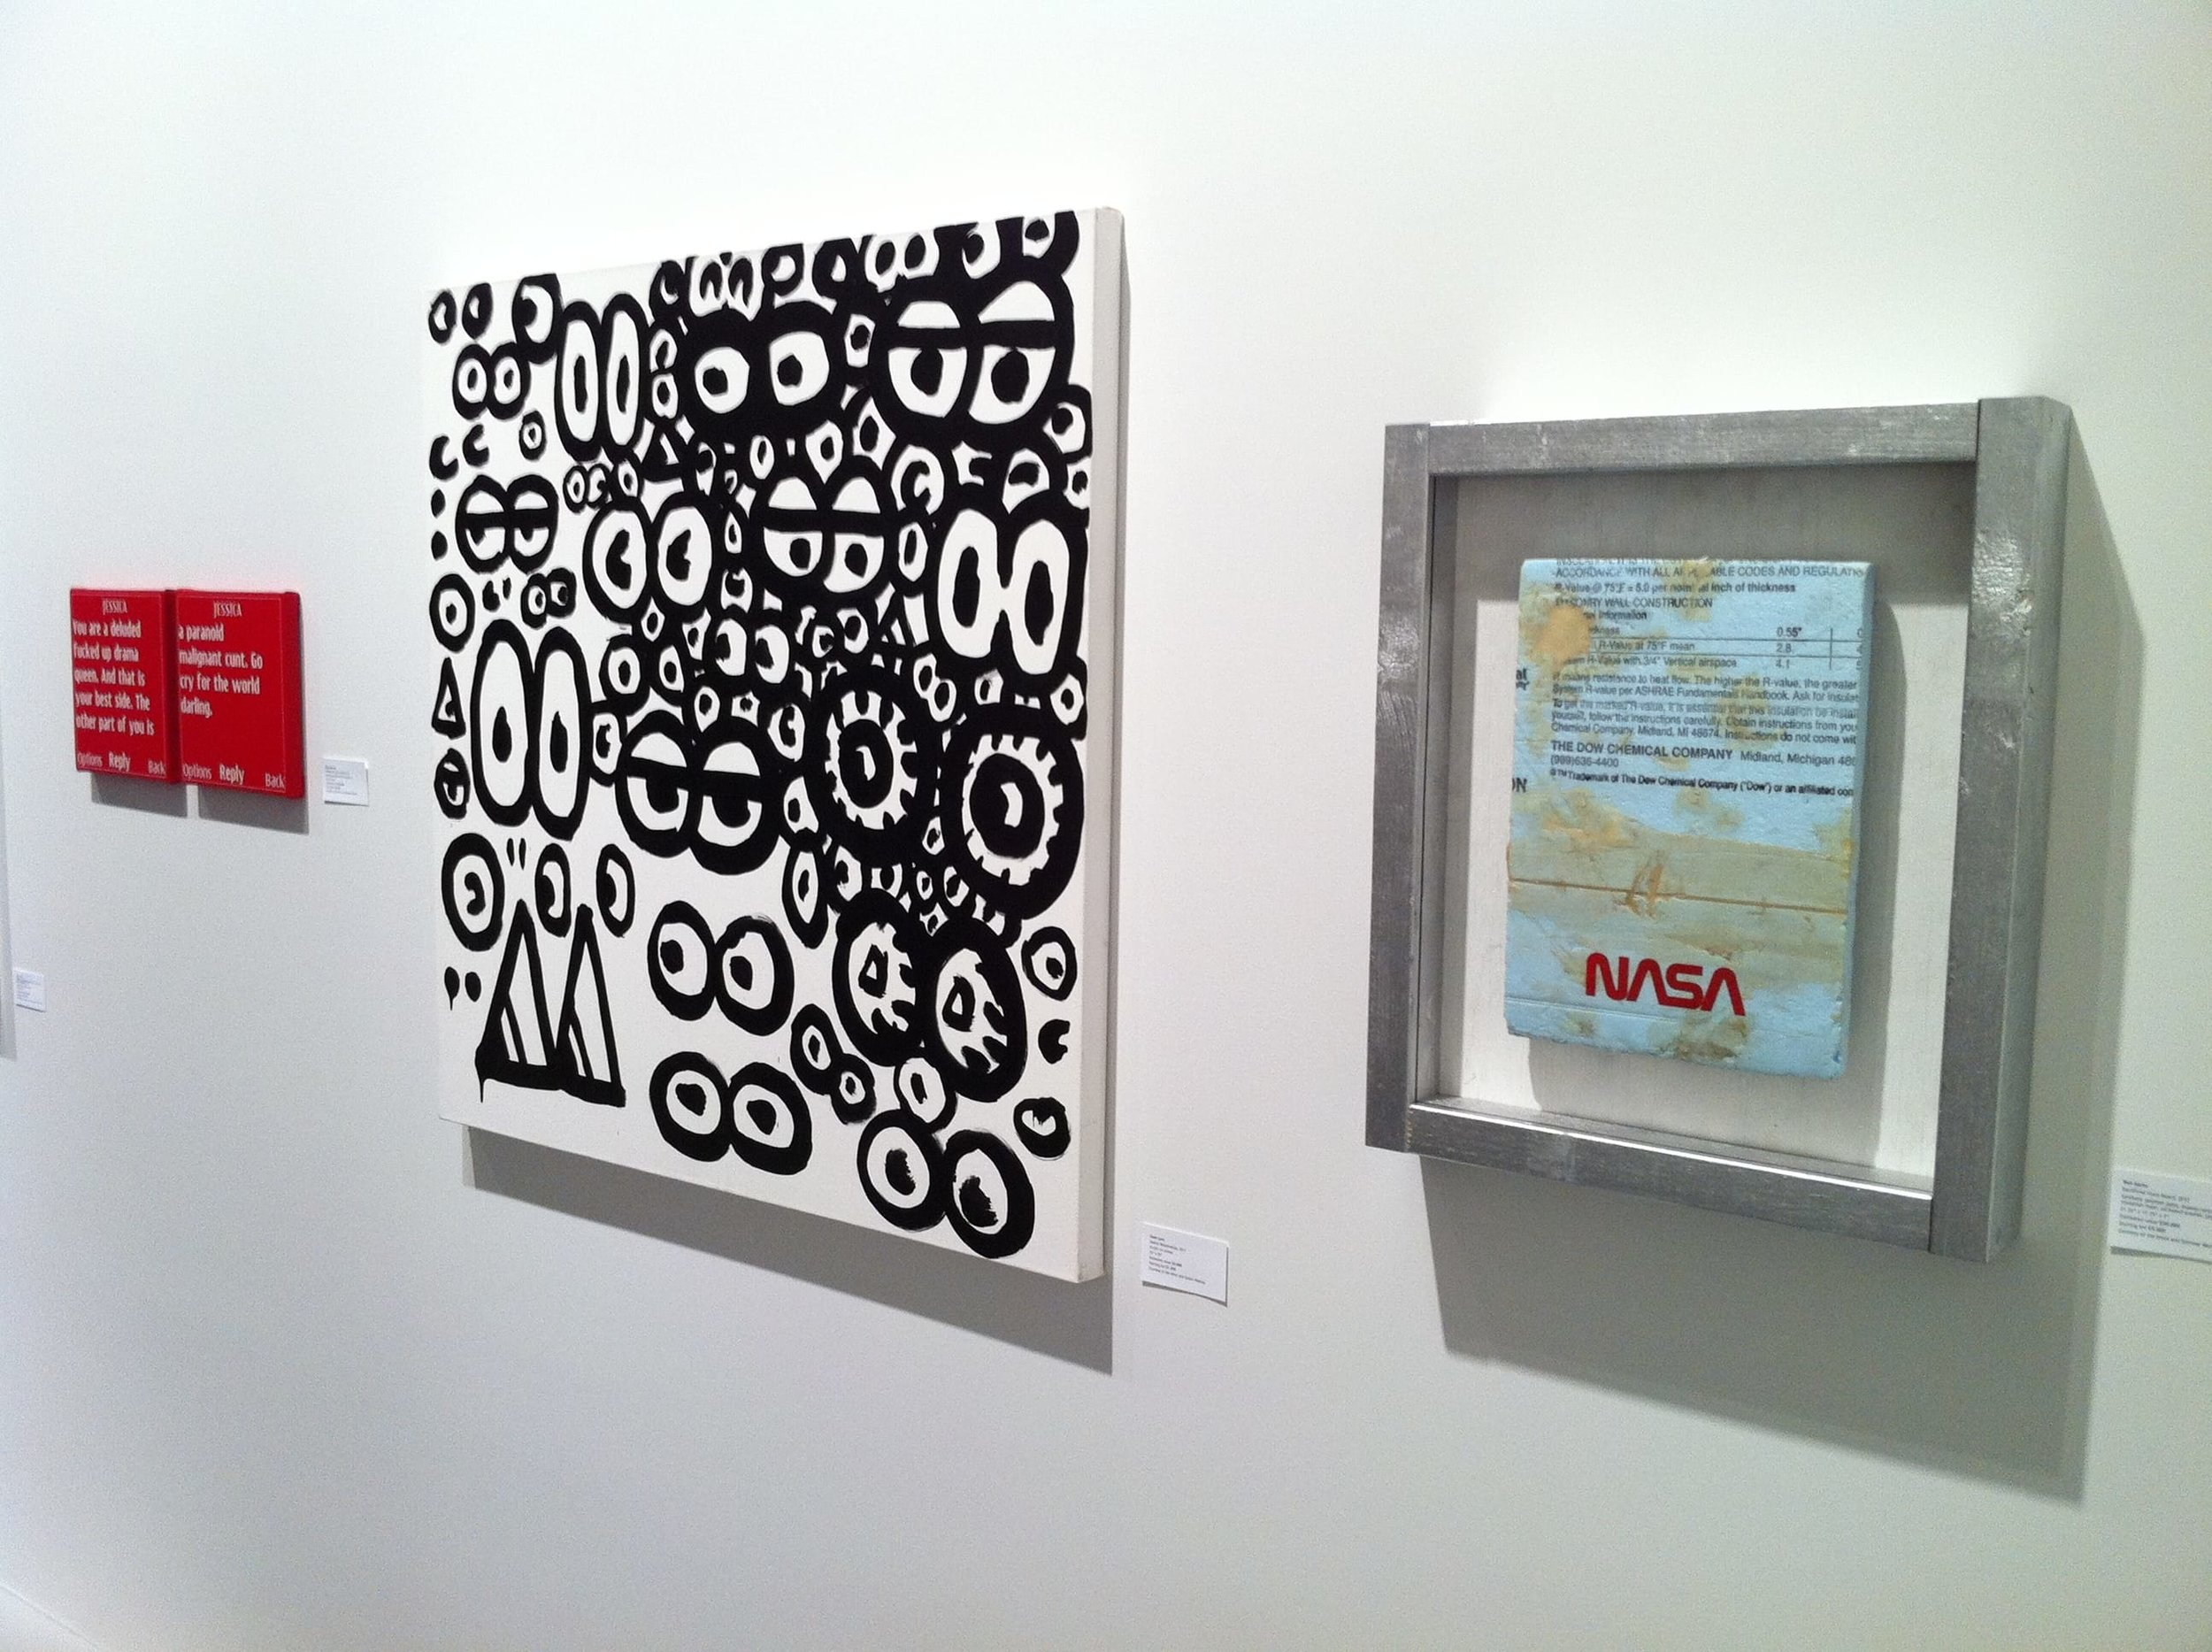 Adam McEwen, Noah Lyon, Tom Sachs